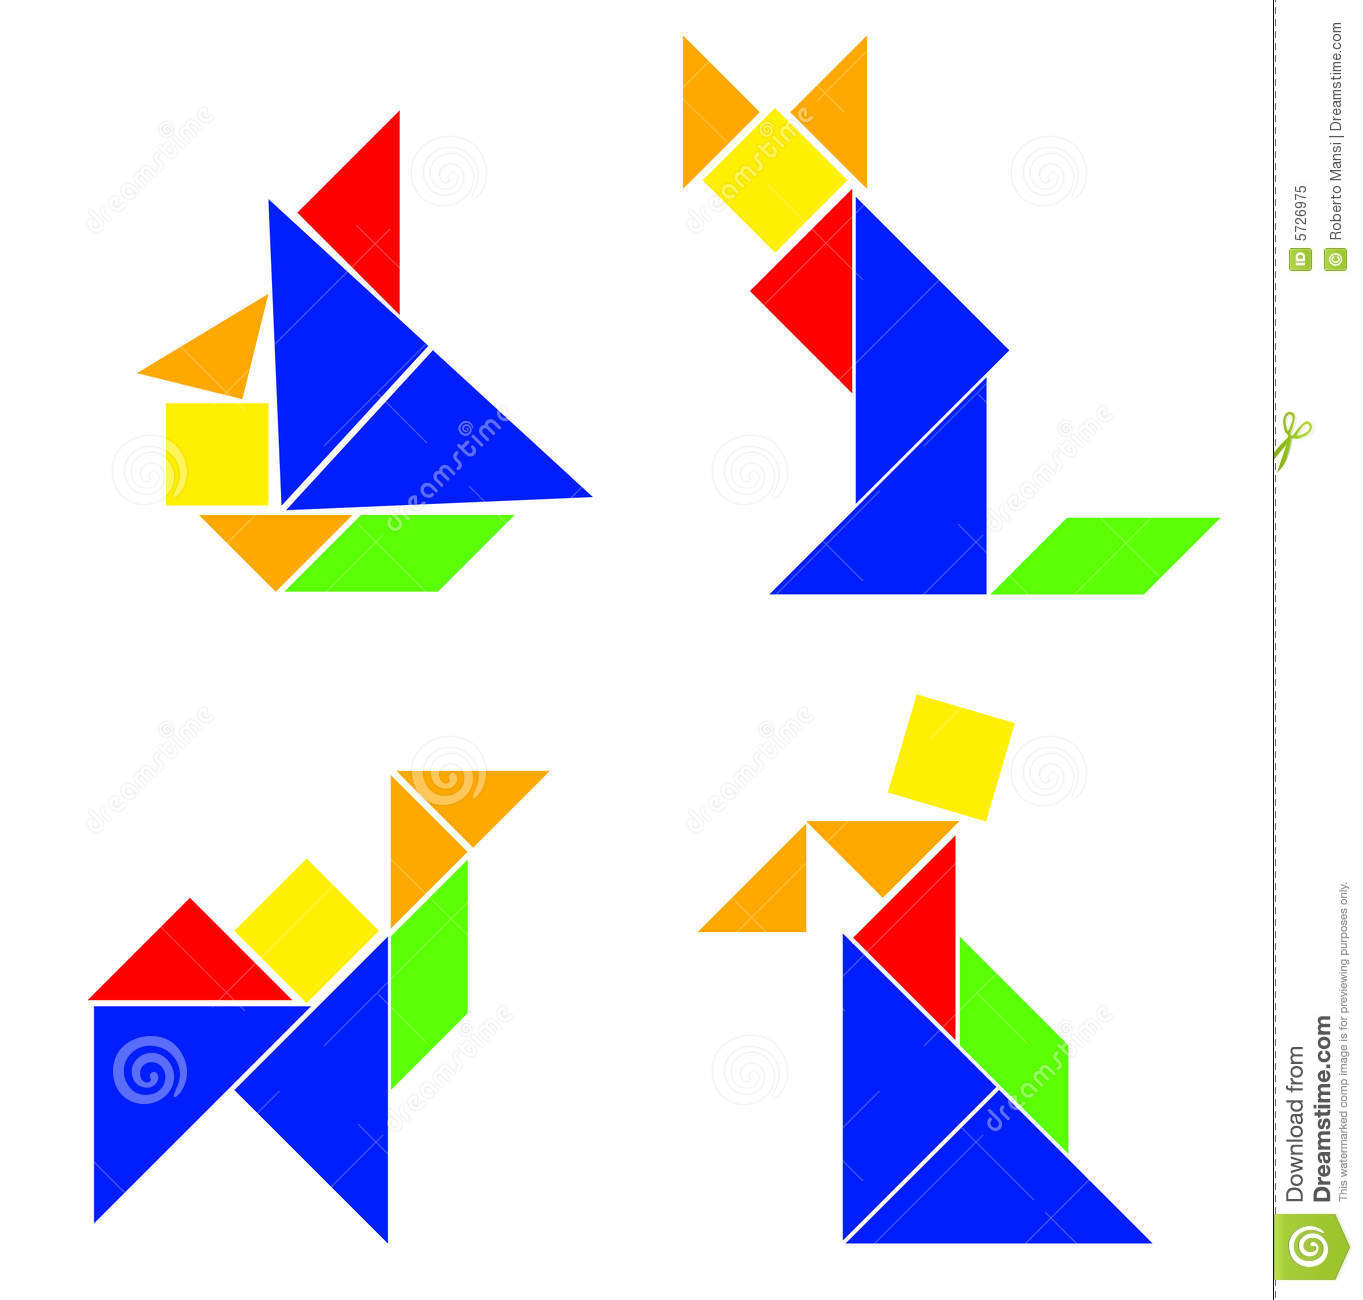 Classic Tangram - Various Compositions Stock Illustration à Tangram Chat